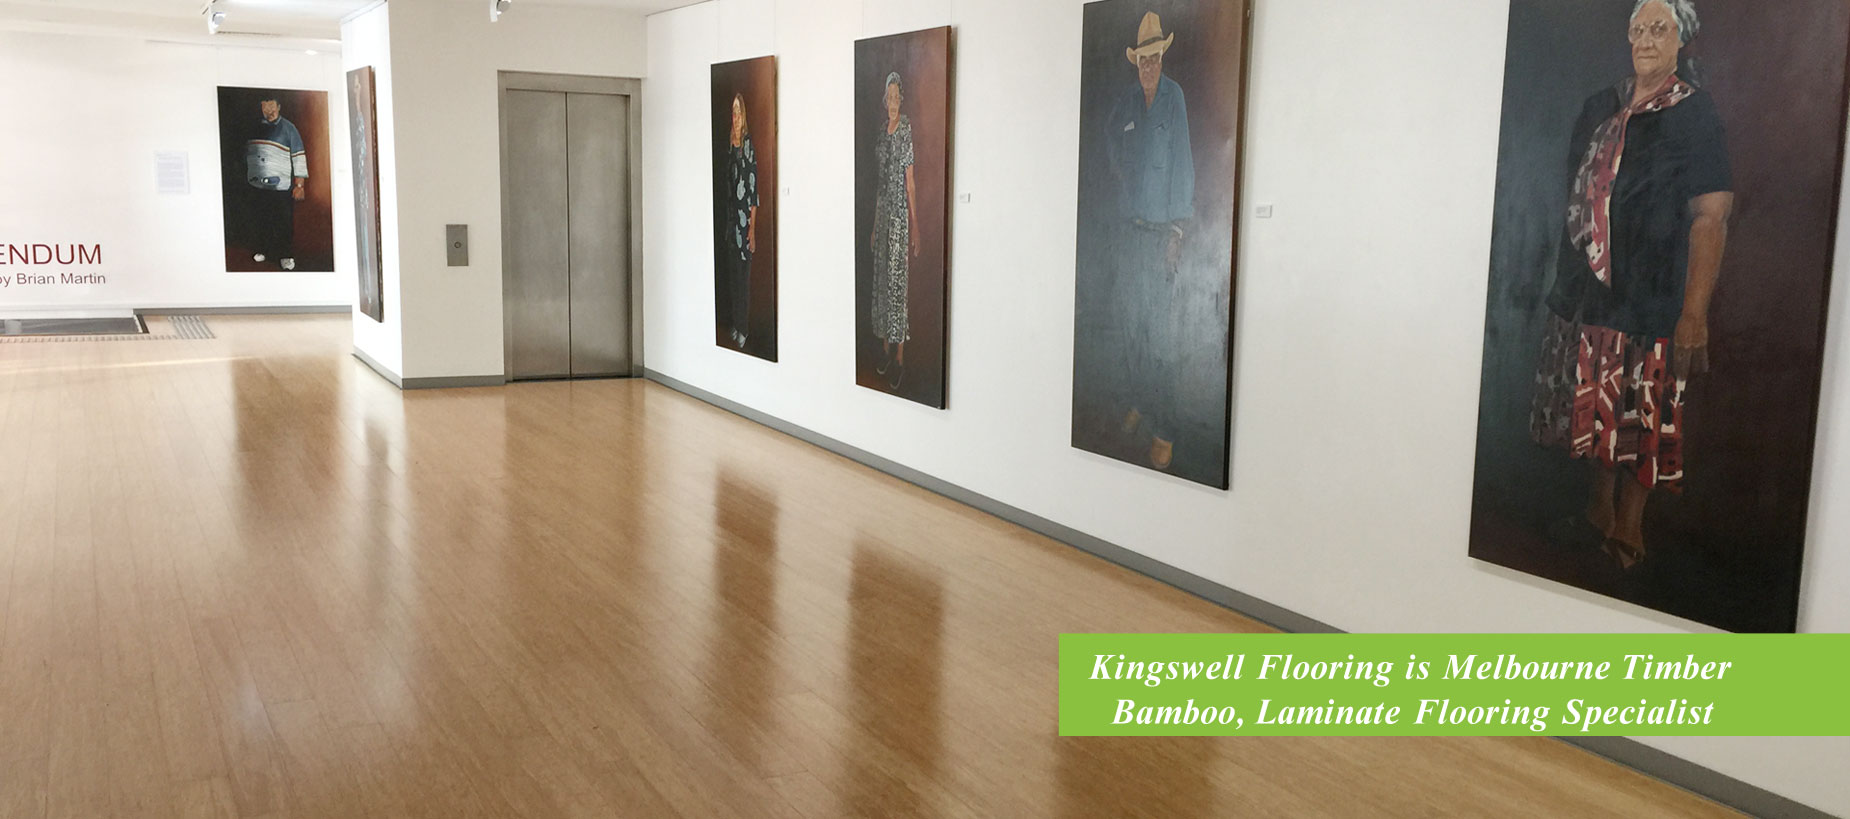 Kingswell Flooring